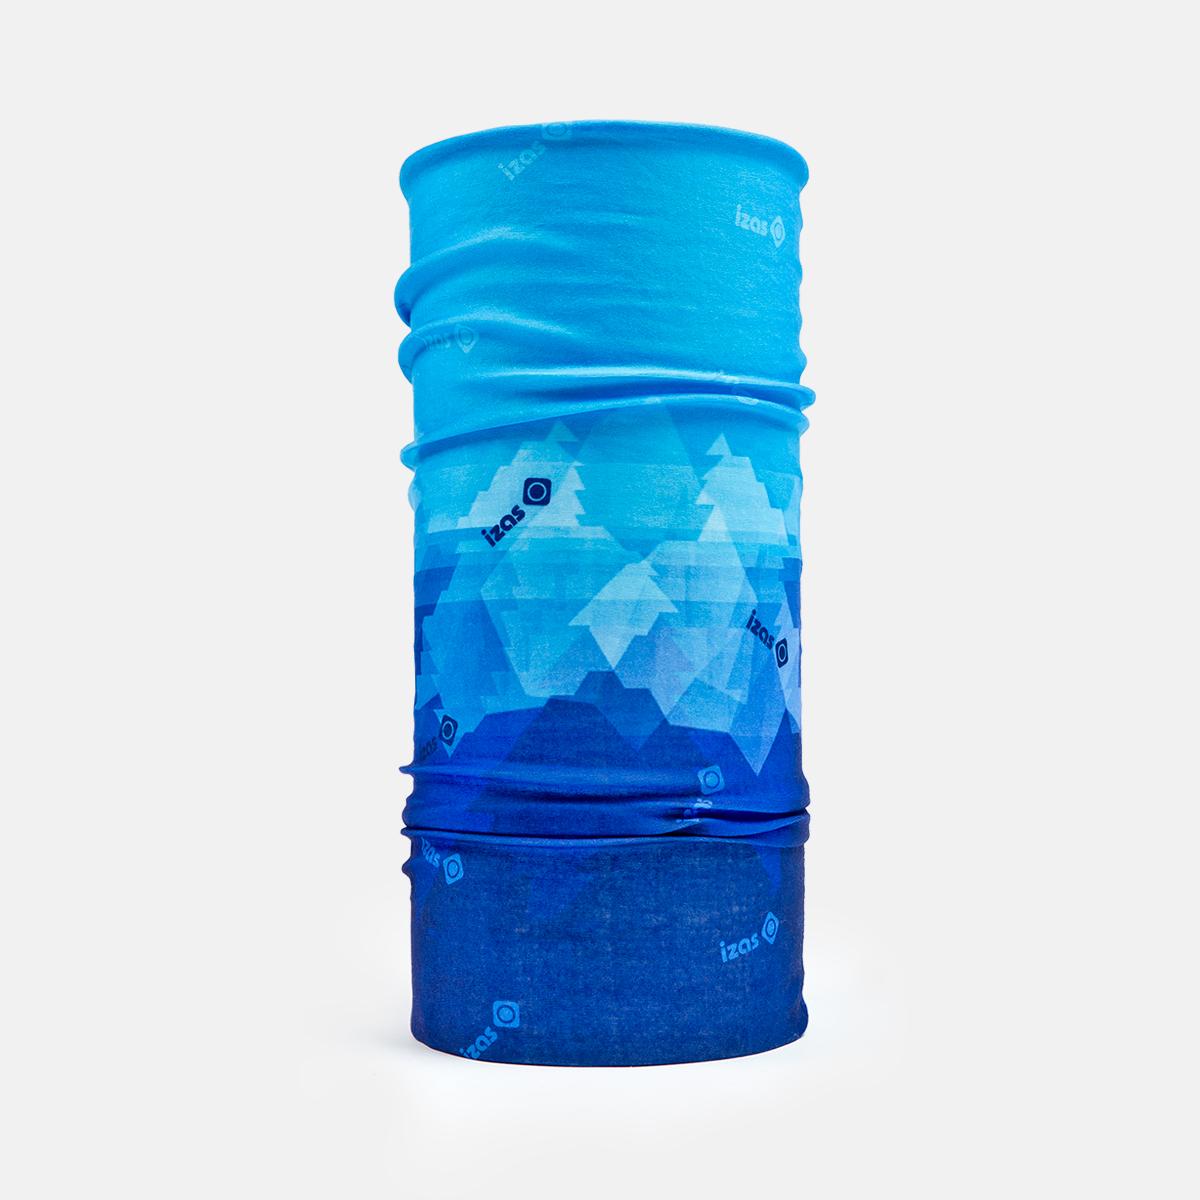 UNISEX'S KIRAT NECKWEAR BLUE